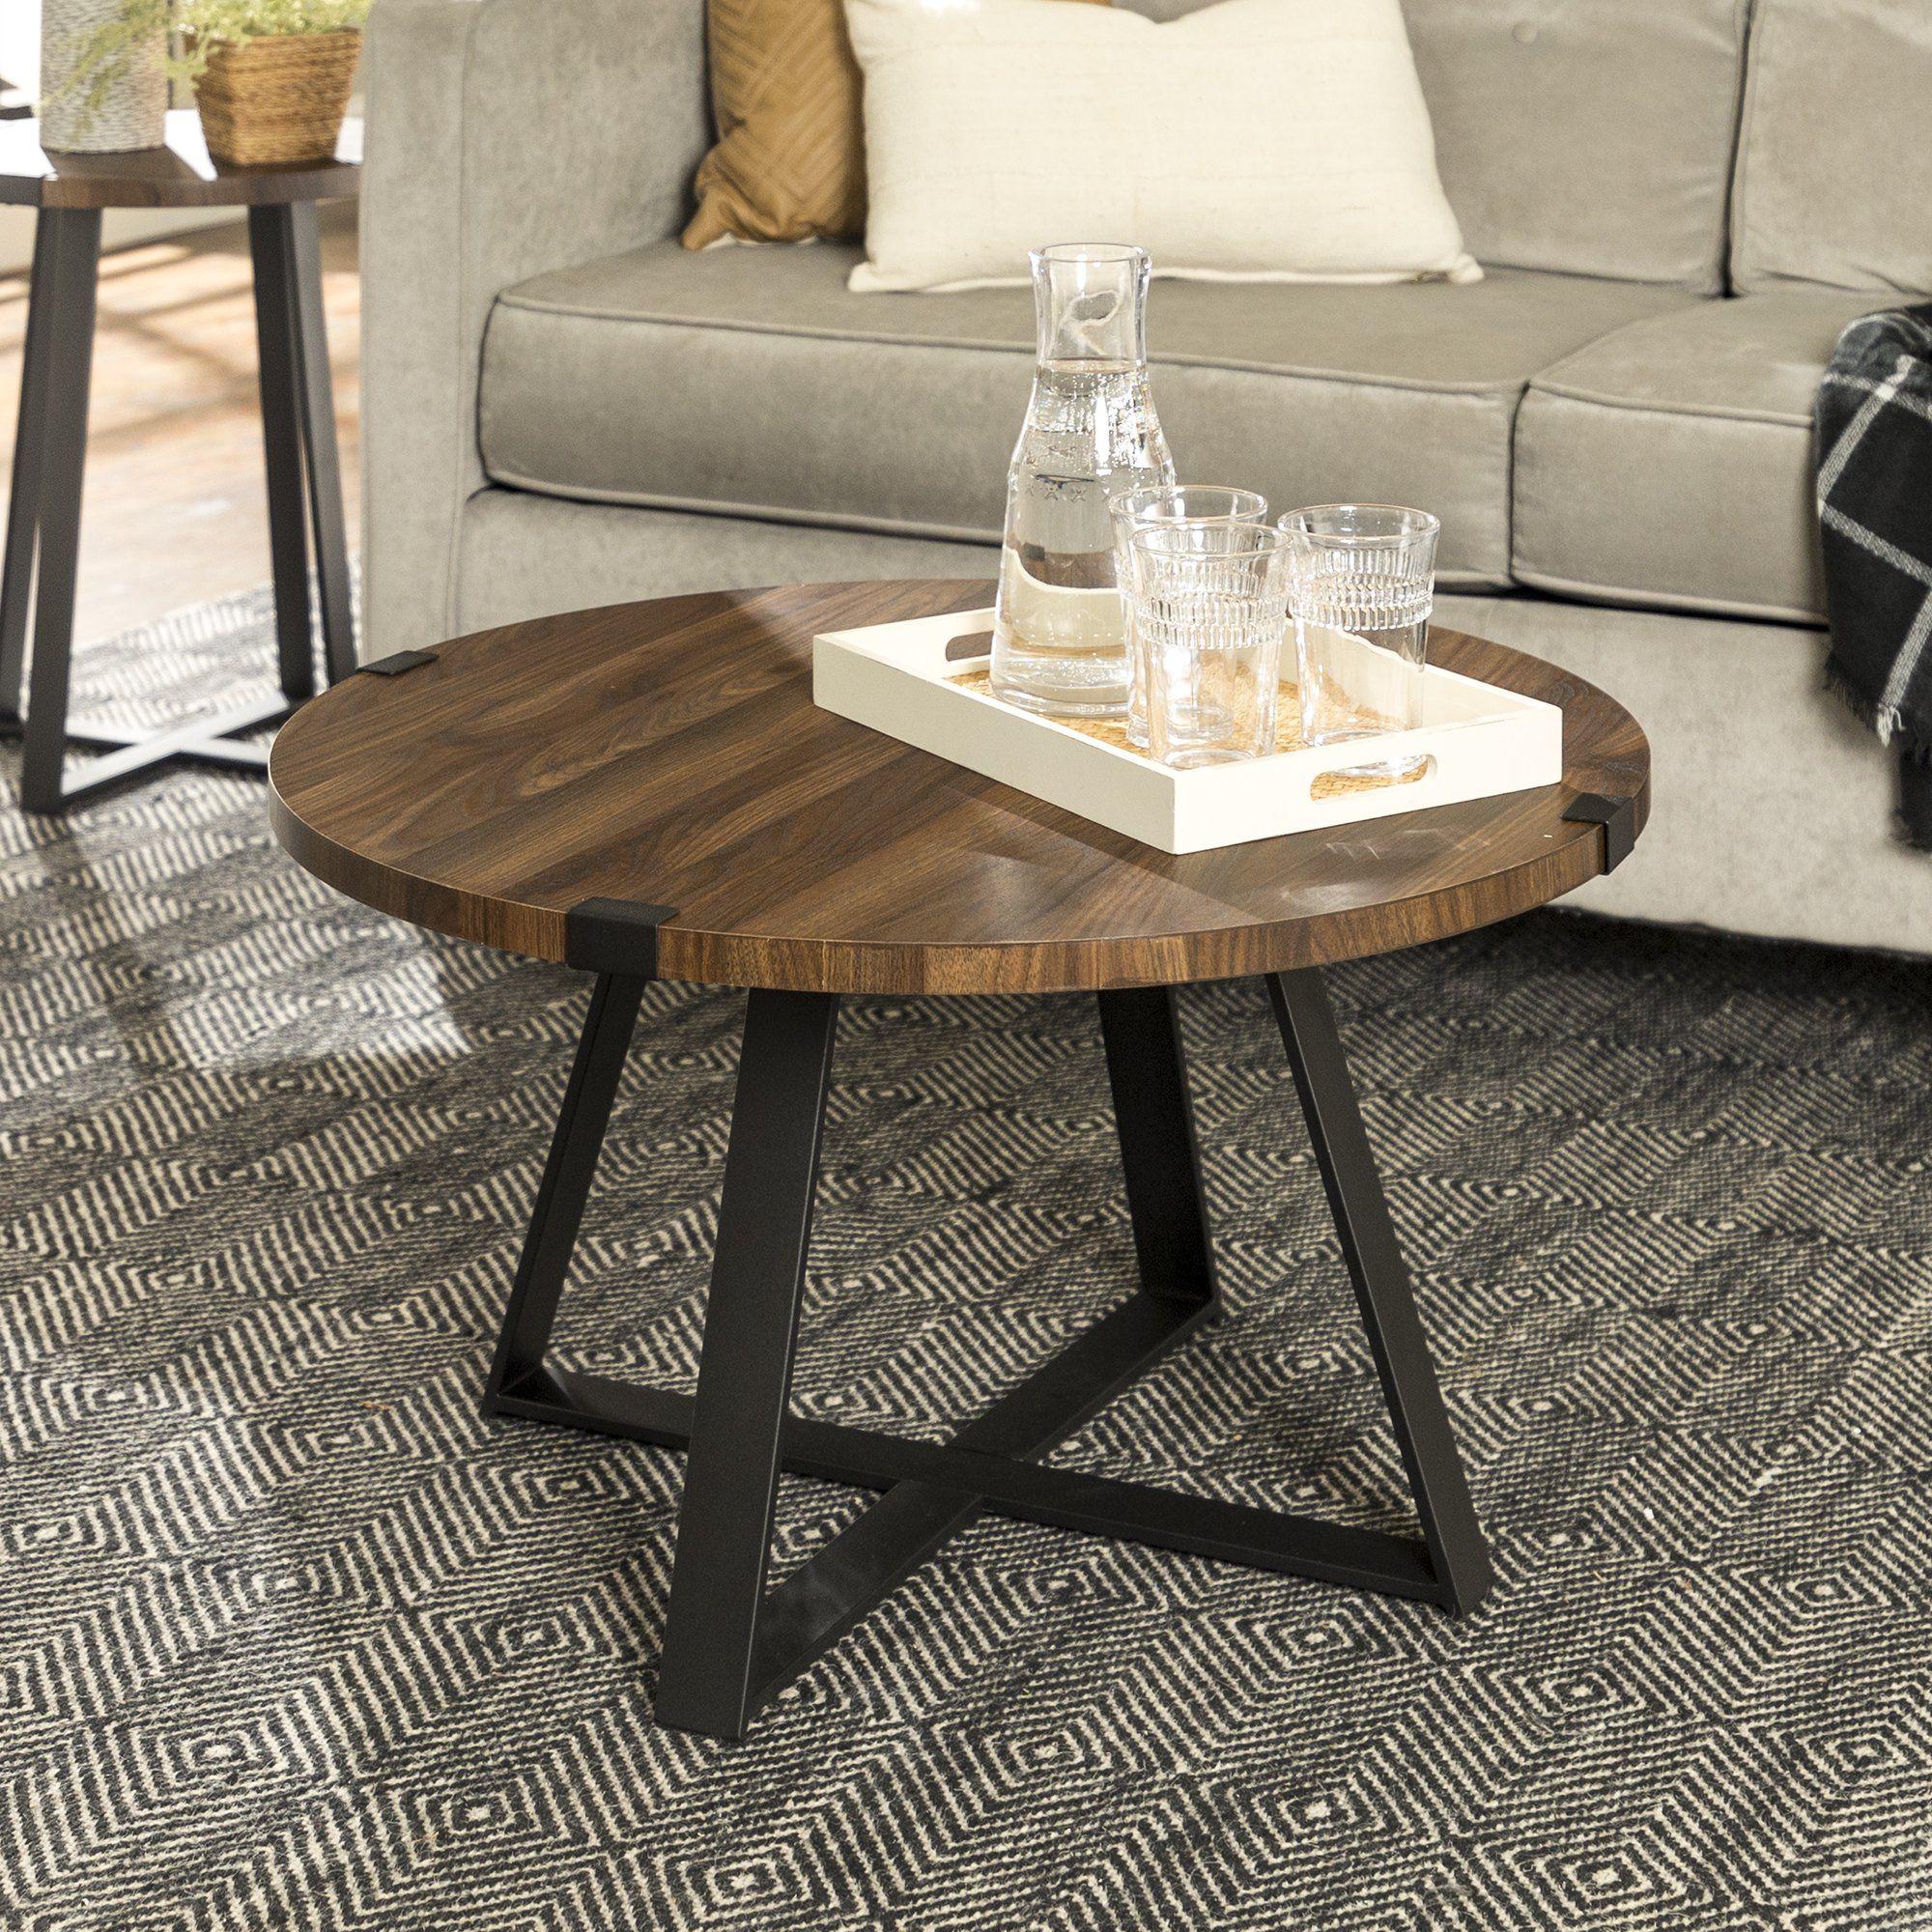 Slate Wrap Leg Grey Wash Coffee Table By River Street Designs Walmart Com In 2021 Round Wood Coffee Table Coffee Table Wood Living Room Coffee Table [ 2000 x 2000 Pixel ]